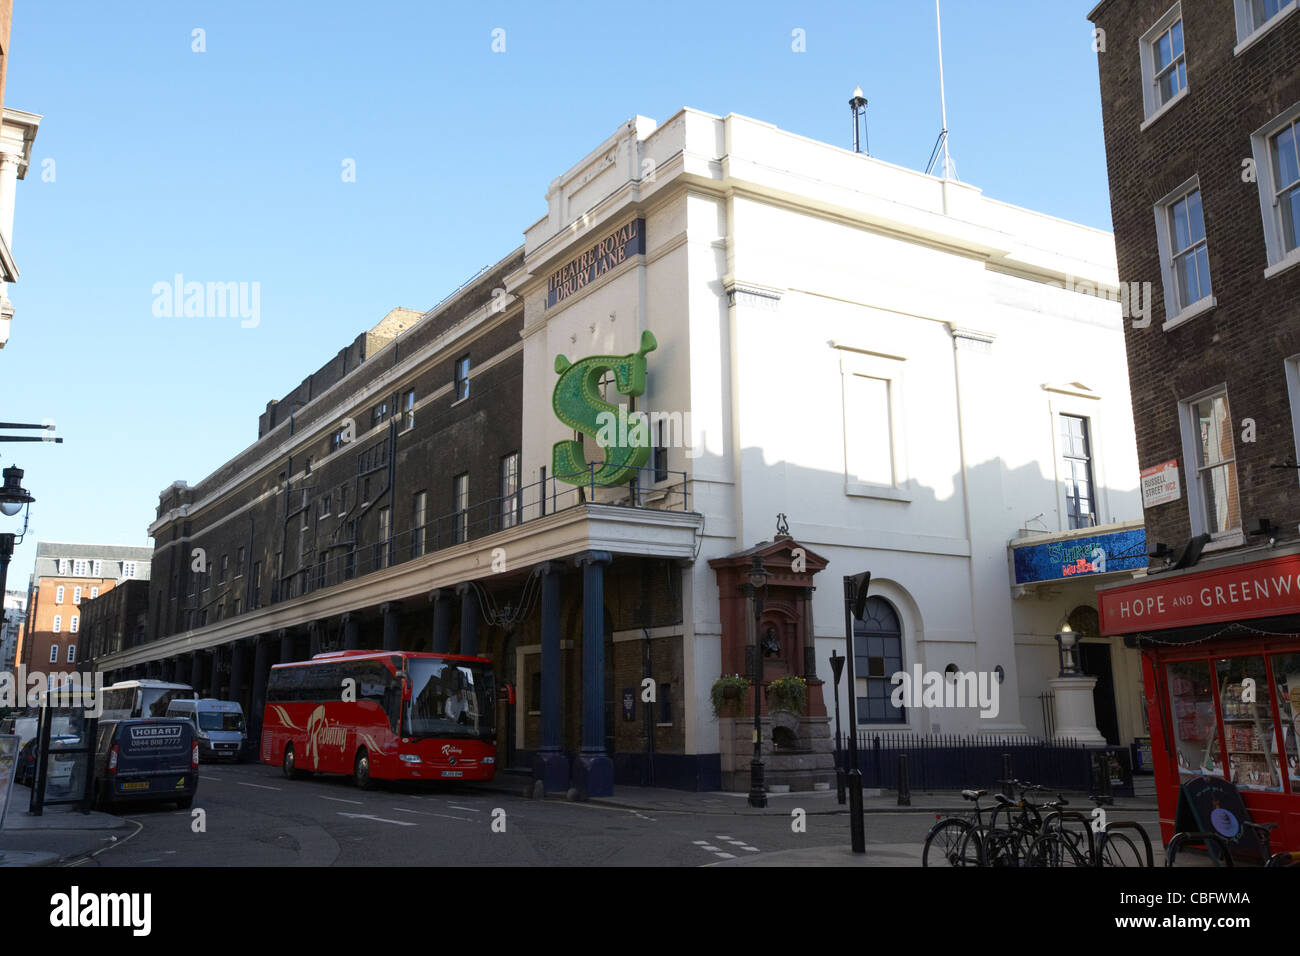 the theatre royal drury lane showing shrek in theatreland west end london england uk united kingdom - Stock Image